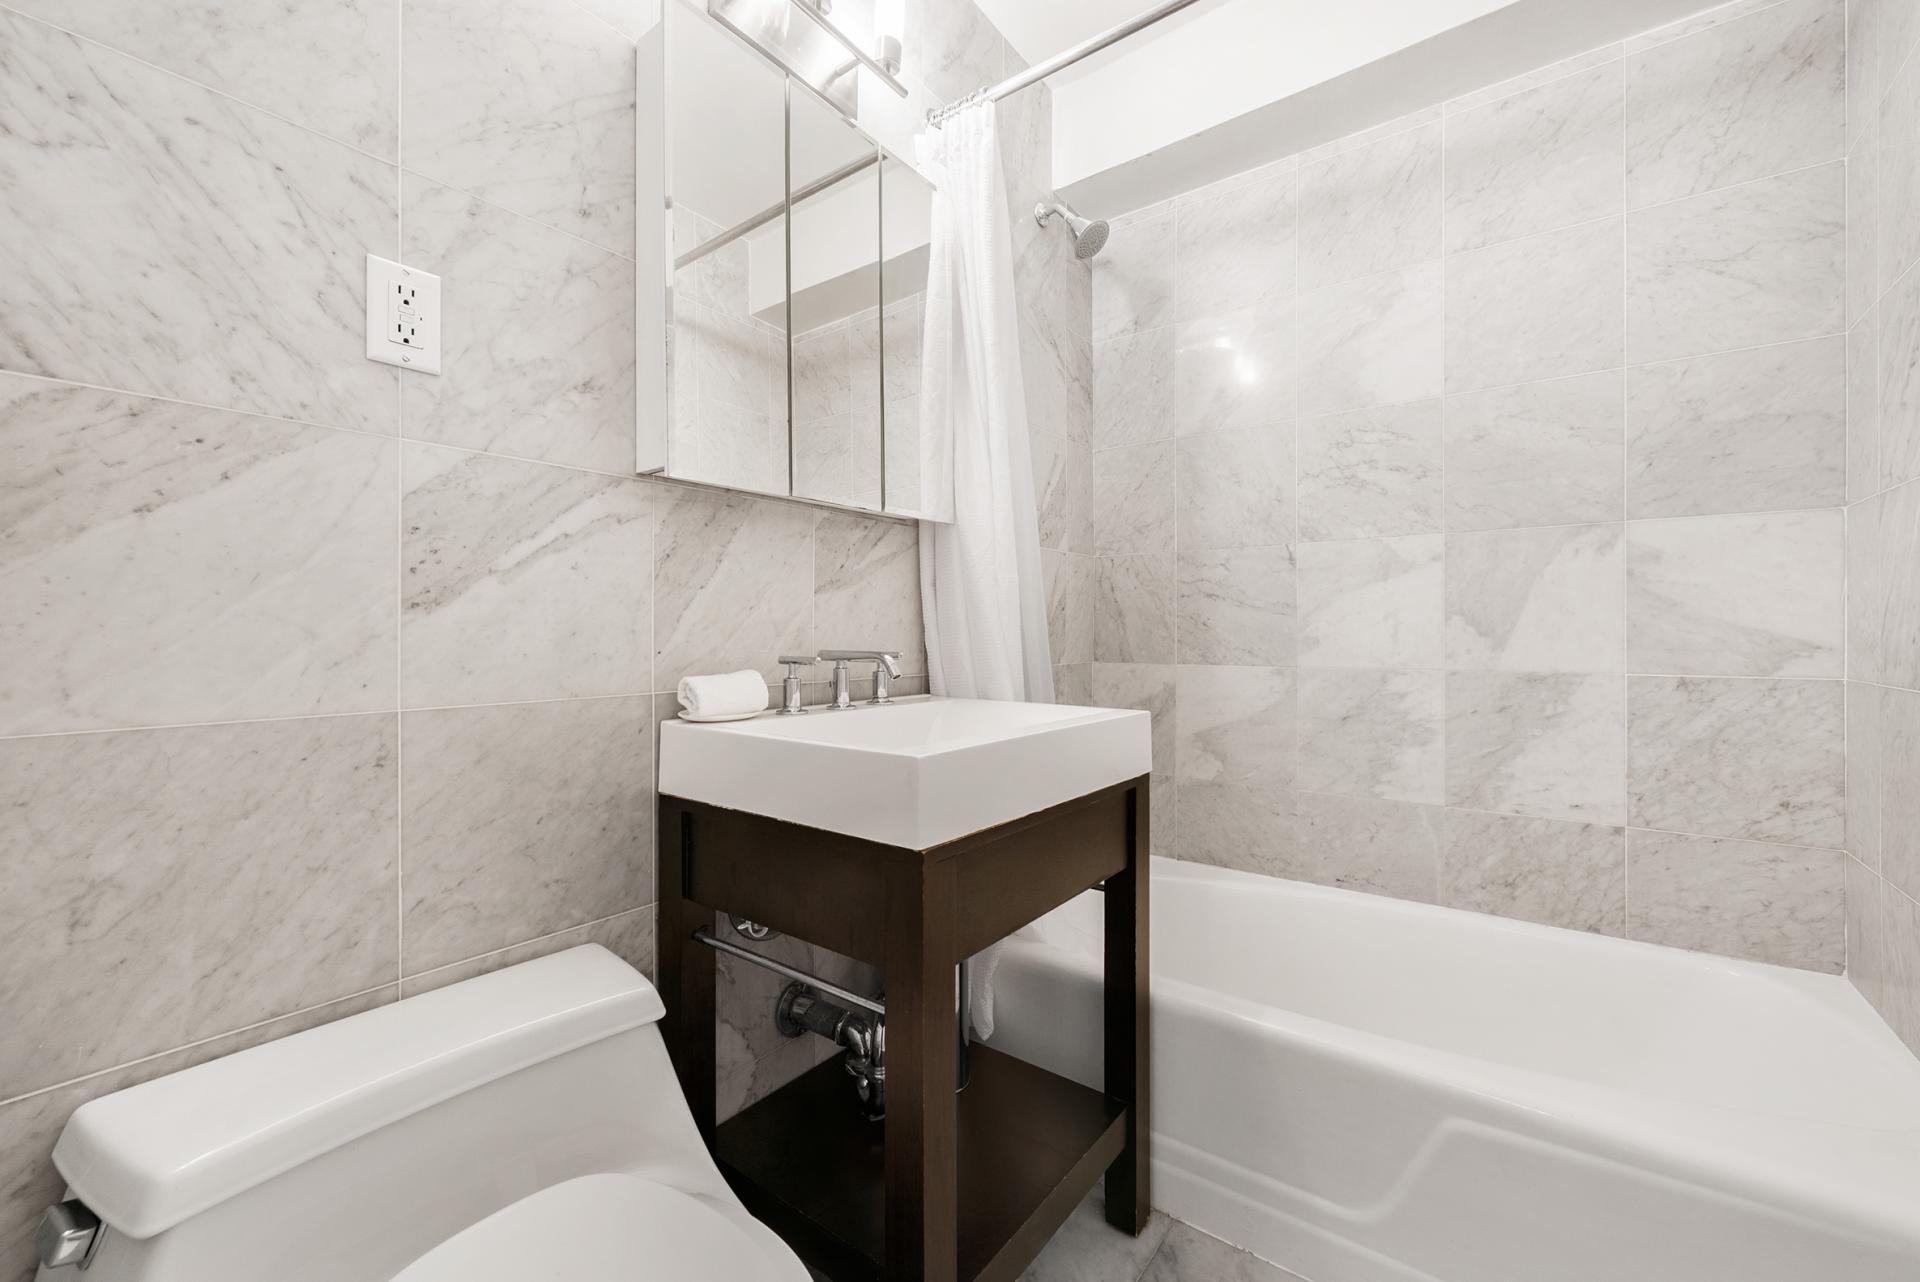 Bathroom 60 East 12th Street Apartments, Greenwich Village, Manhattan